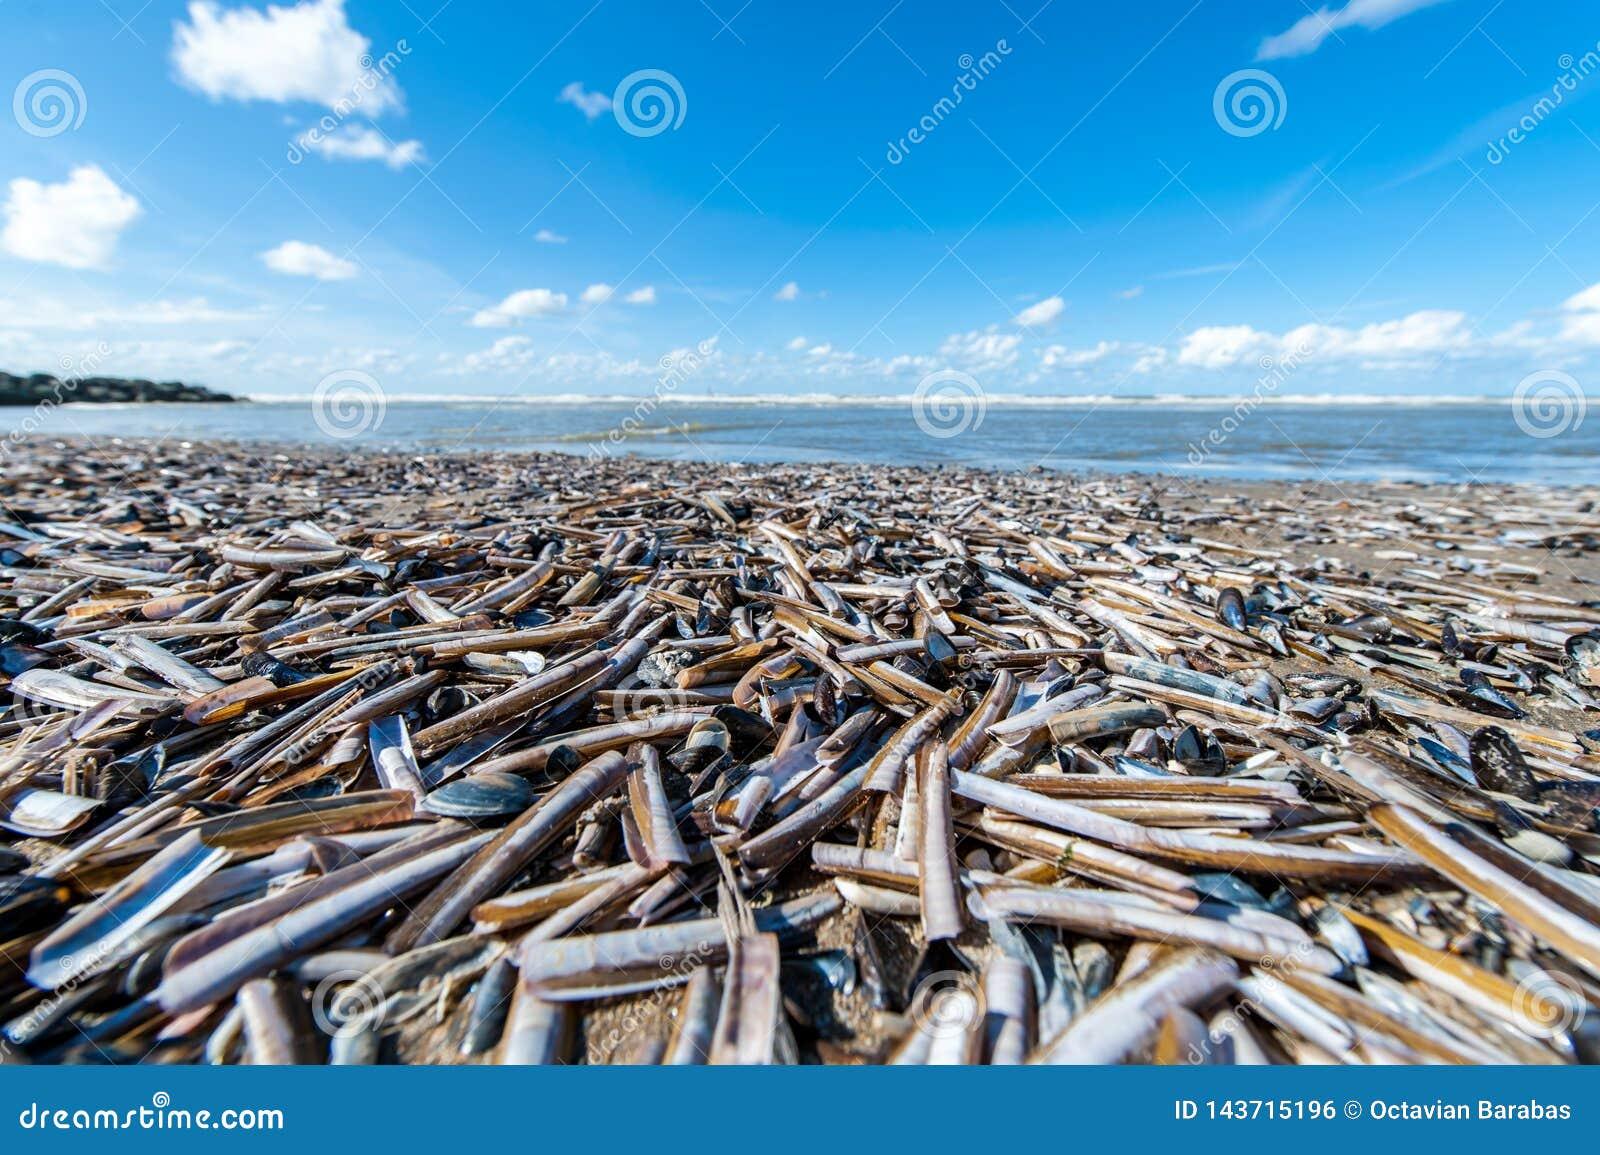 Knife scabbard seashell on a beach